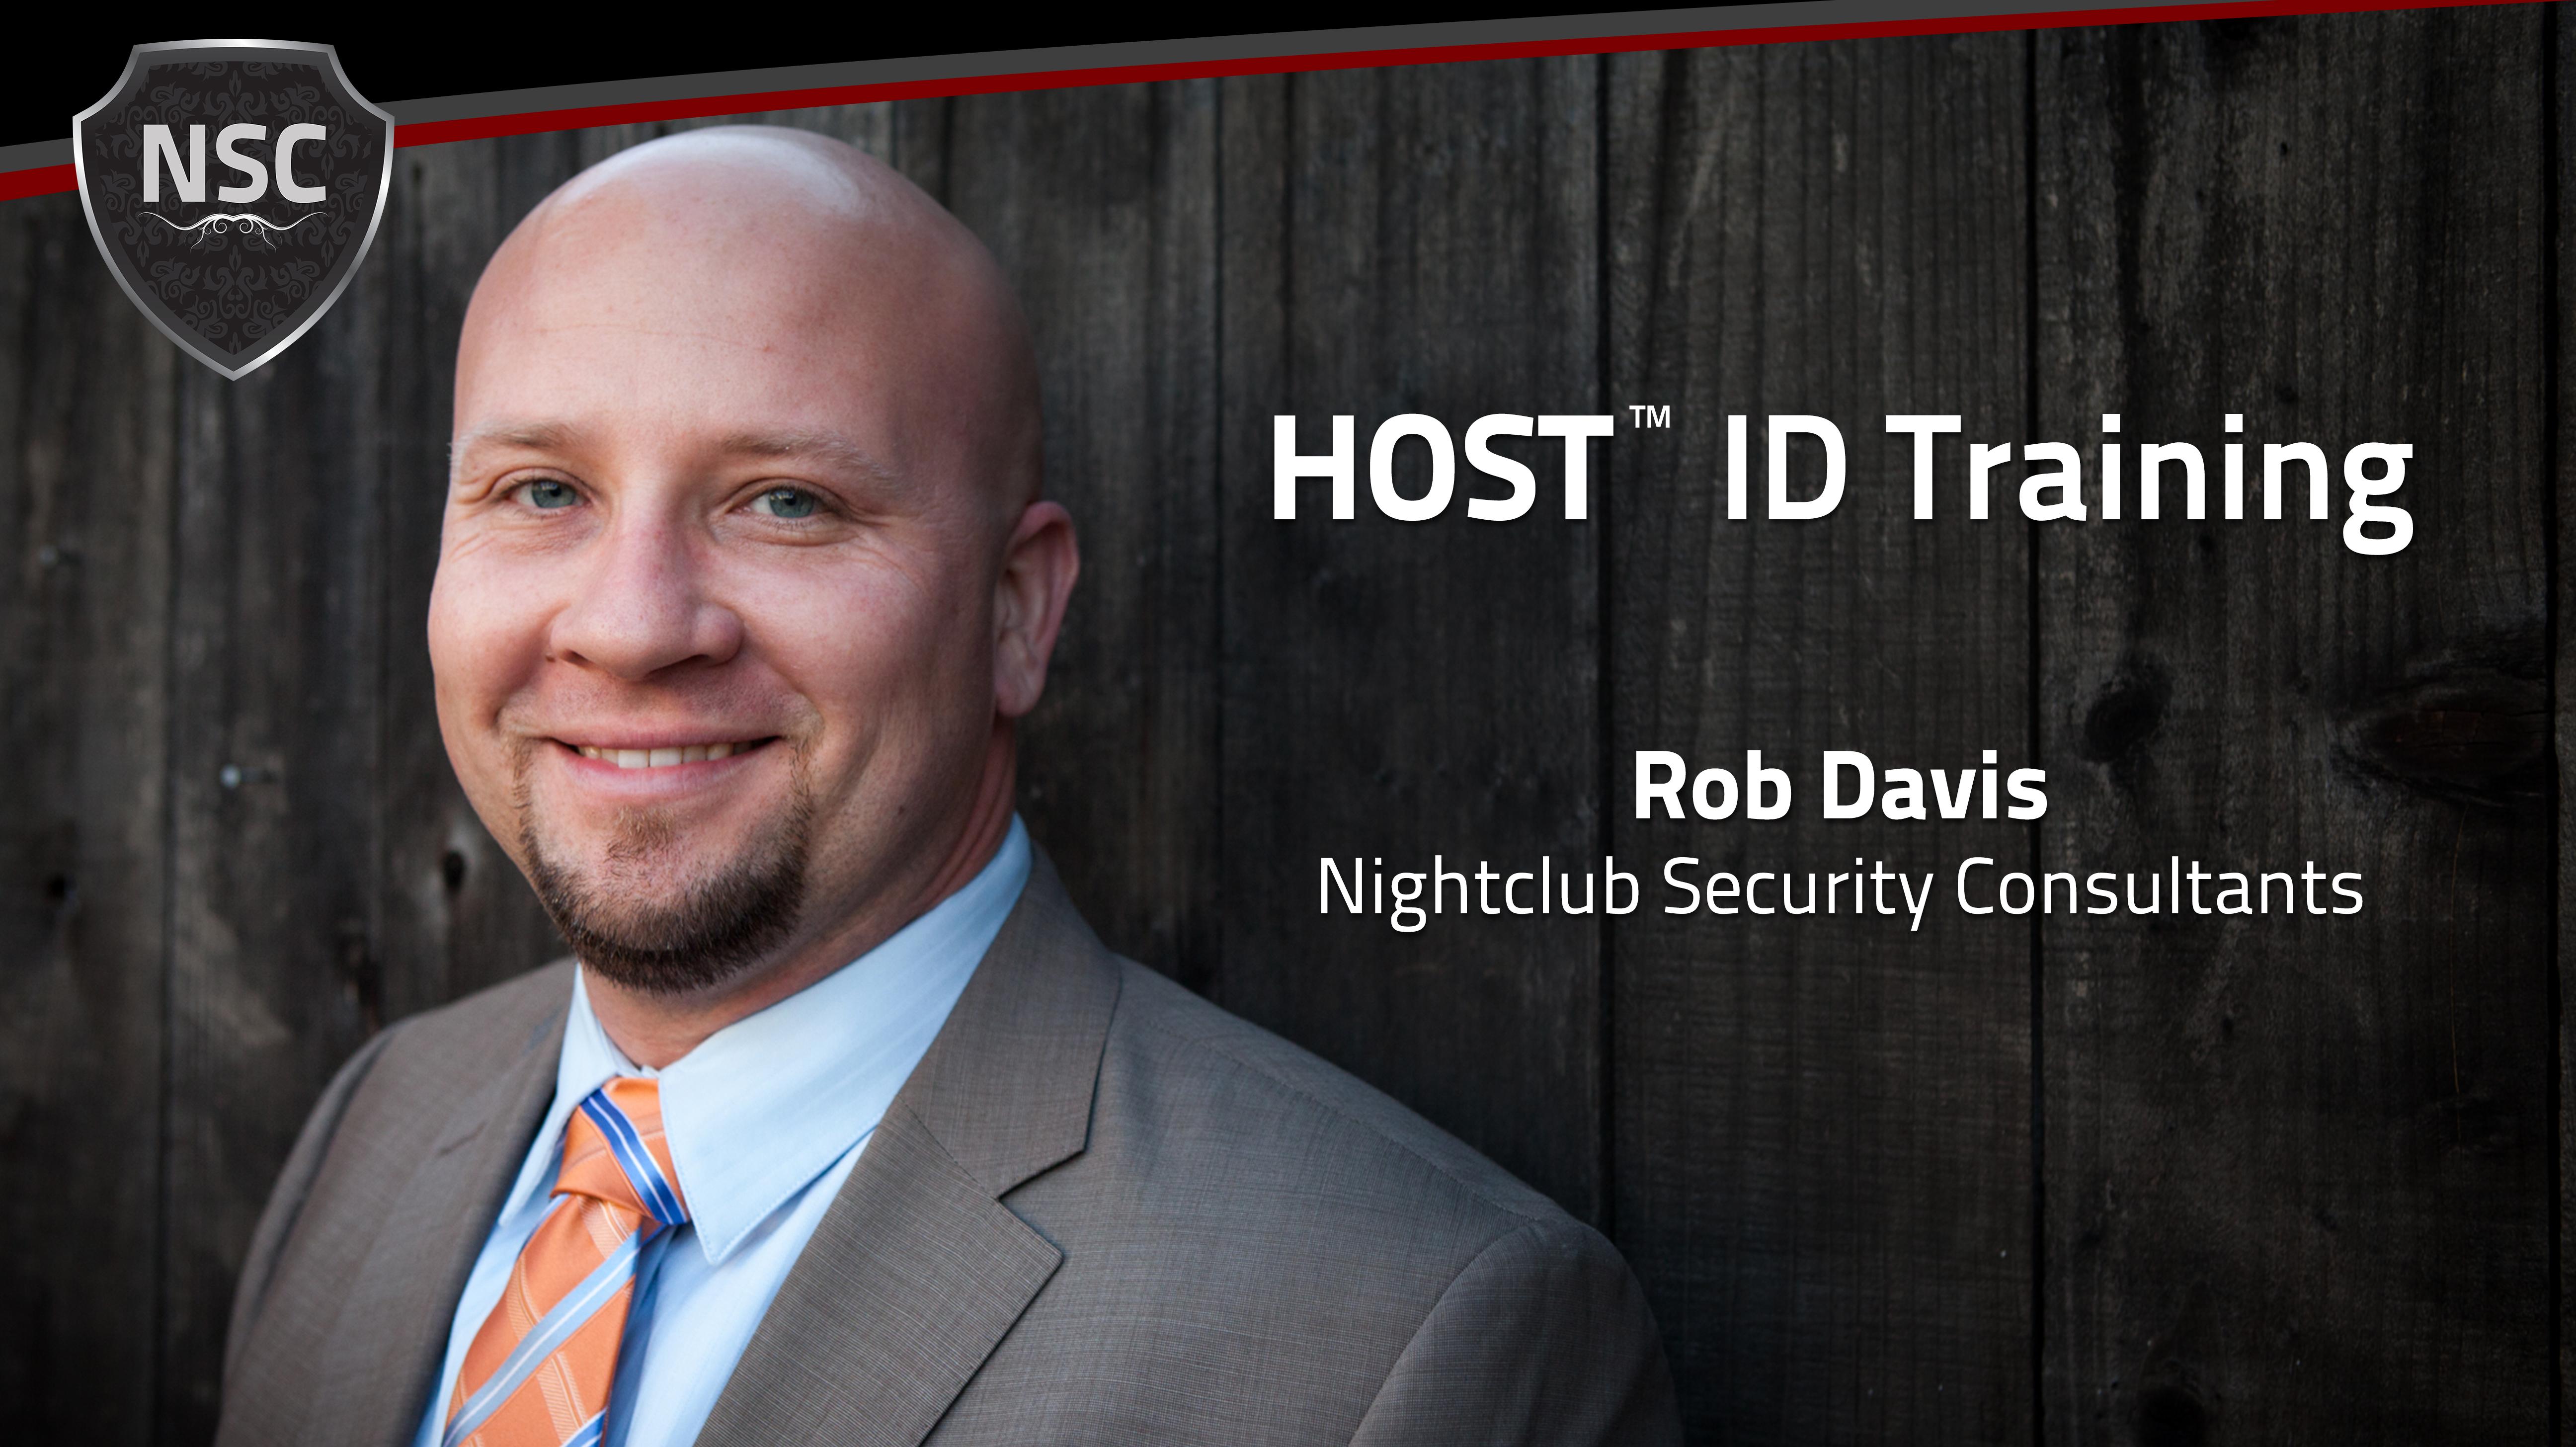 HOST ID Training , Nightclub Security Consultants